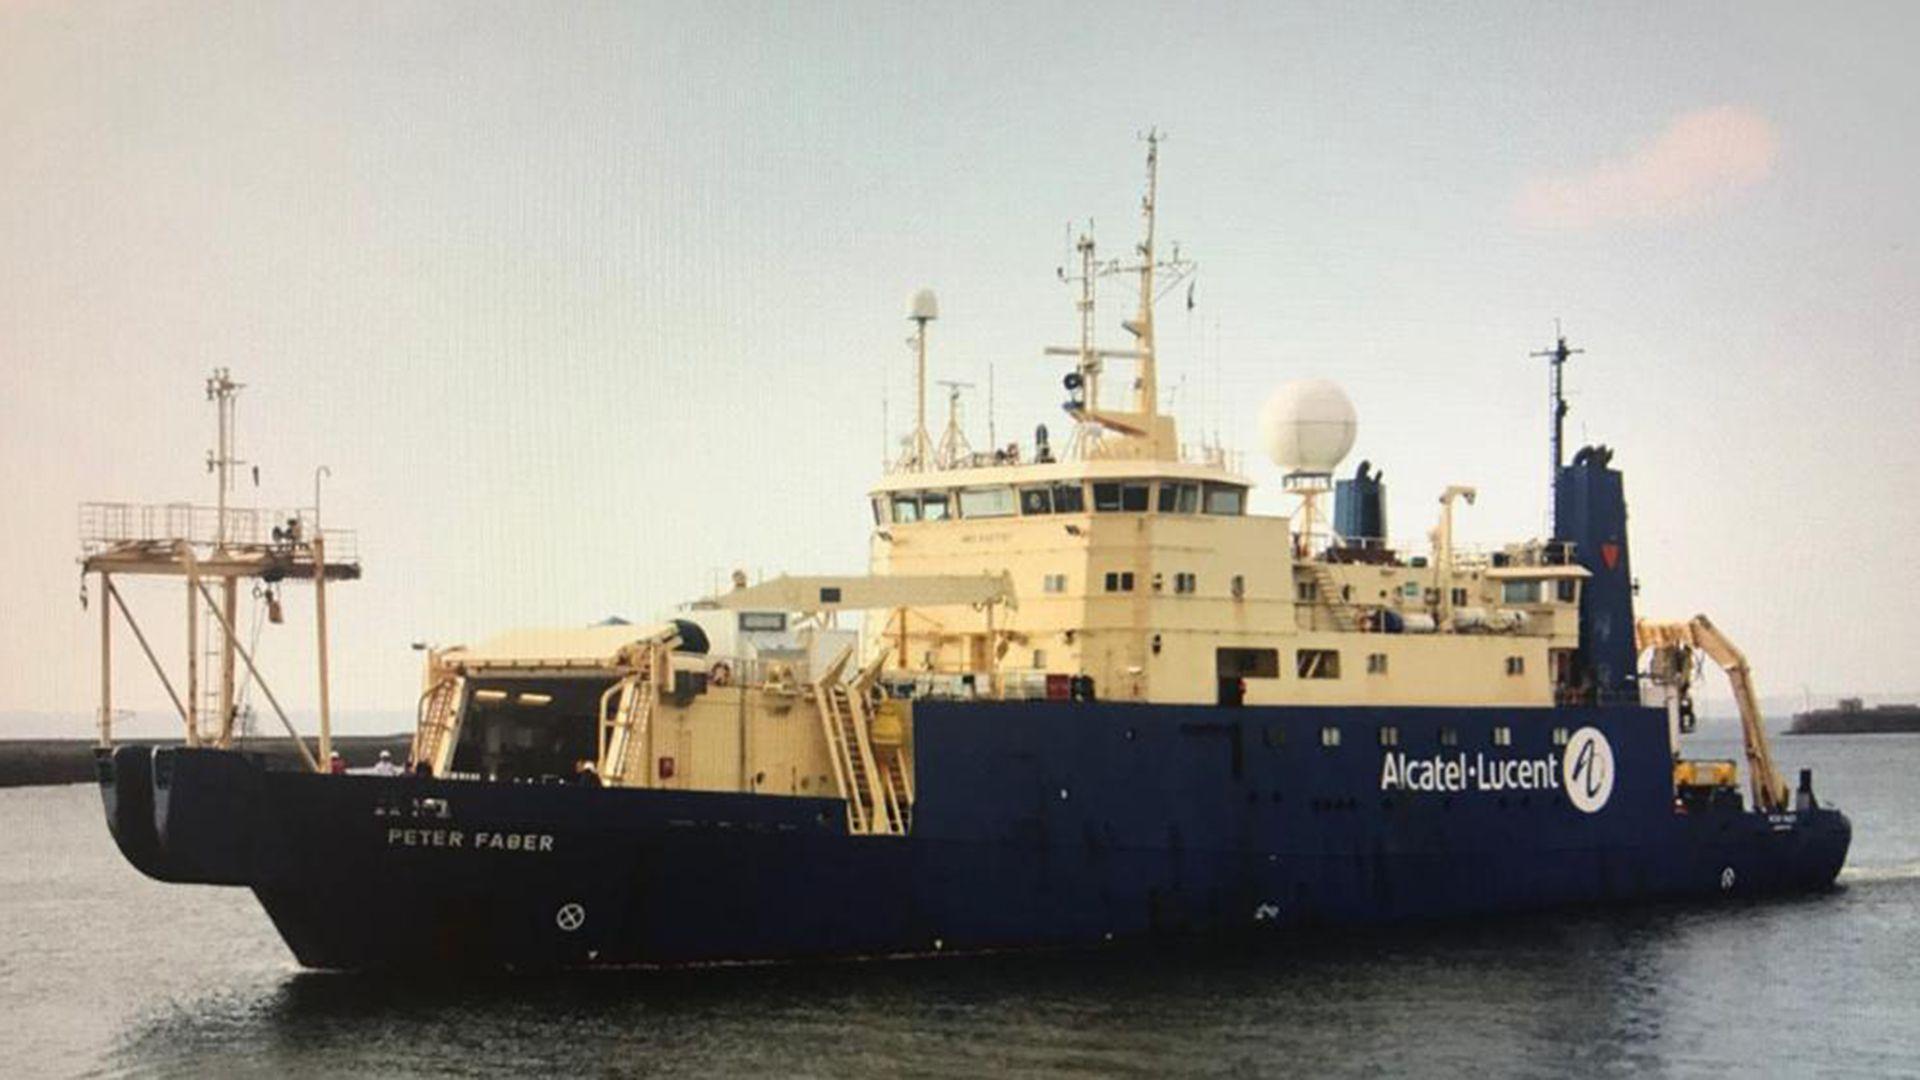 Internet Cable Submarino Peter Faber Ile de Sein Buques franceses